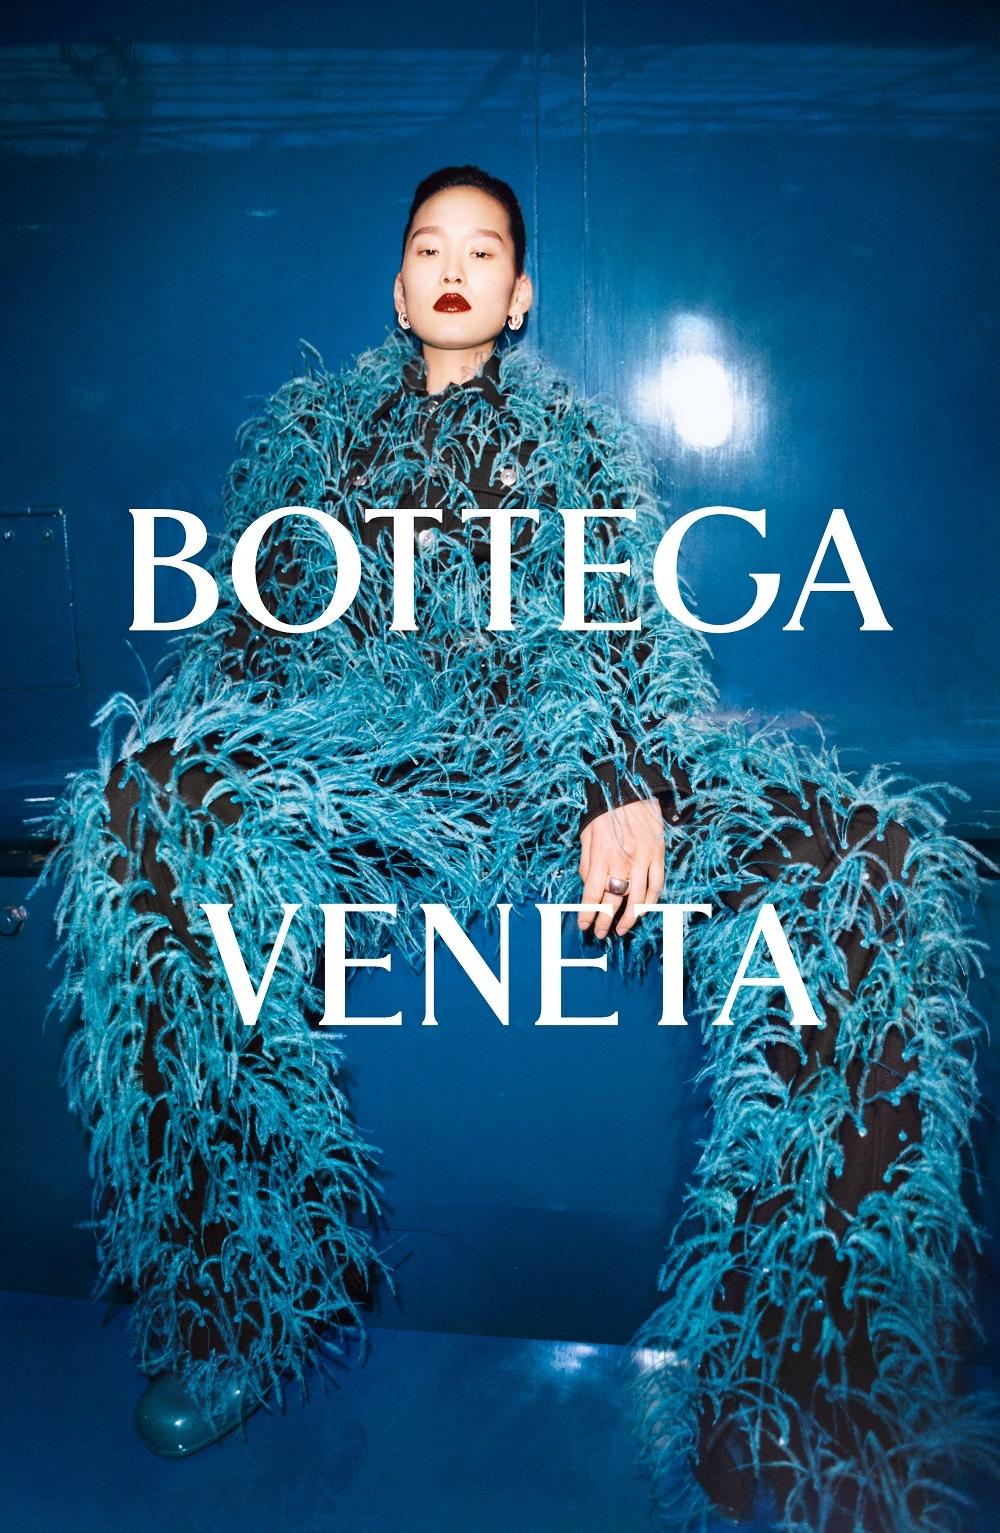 Bottega Veneta Salon 02系列正式揭曉!用手工藝與玩趣廓型來顛覆感官